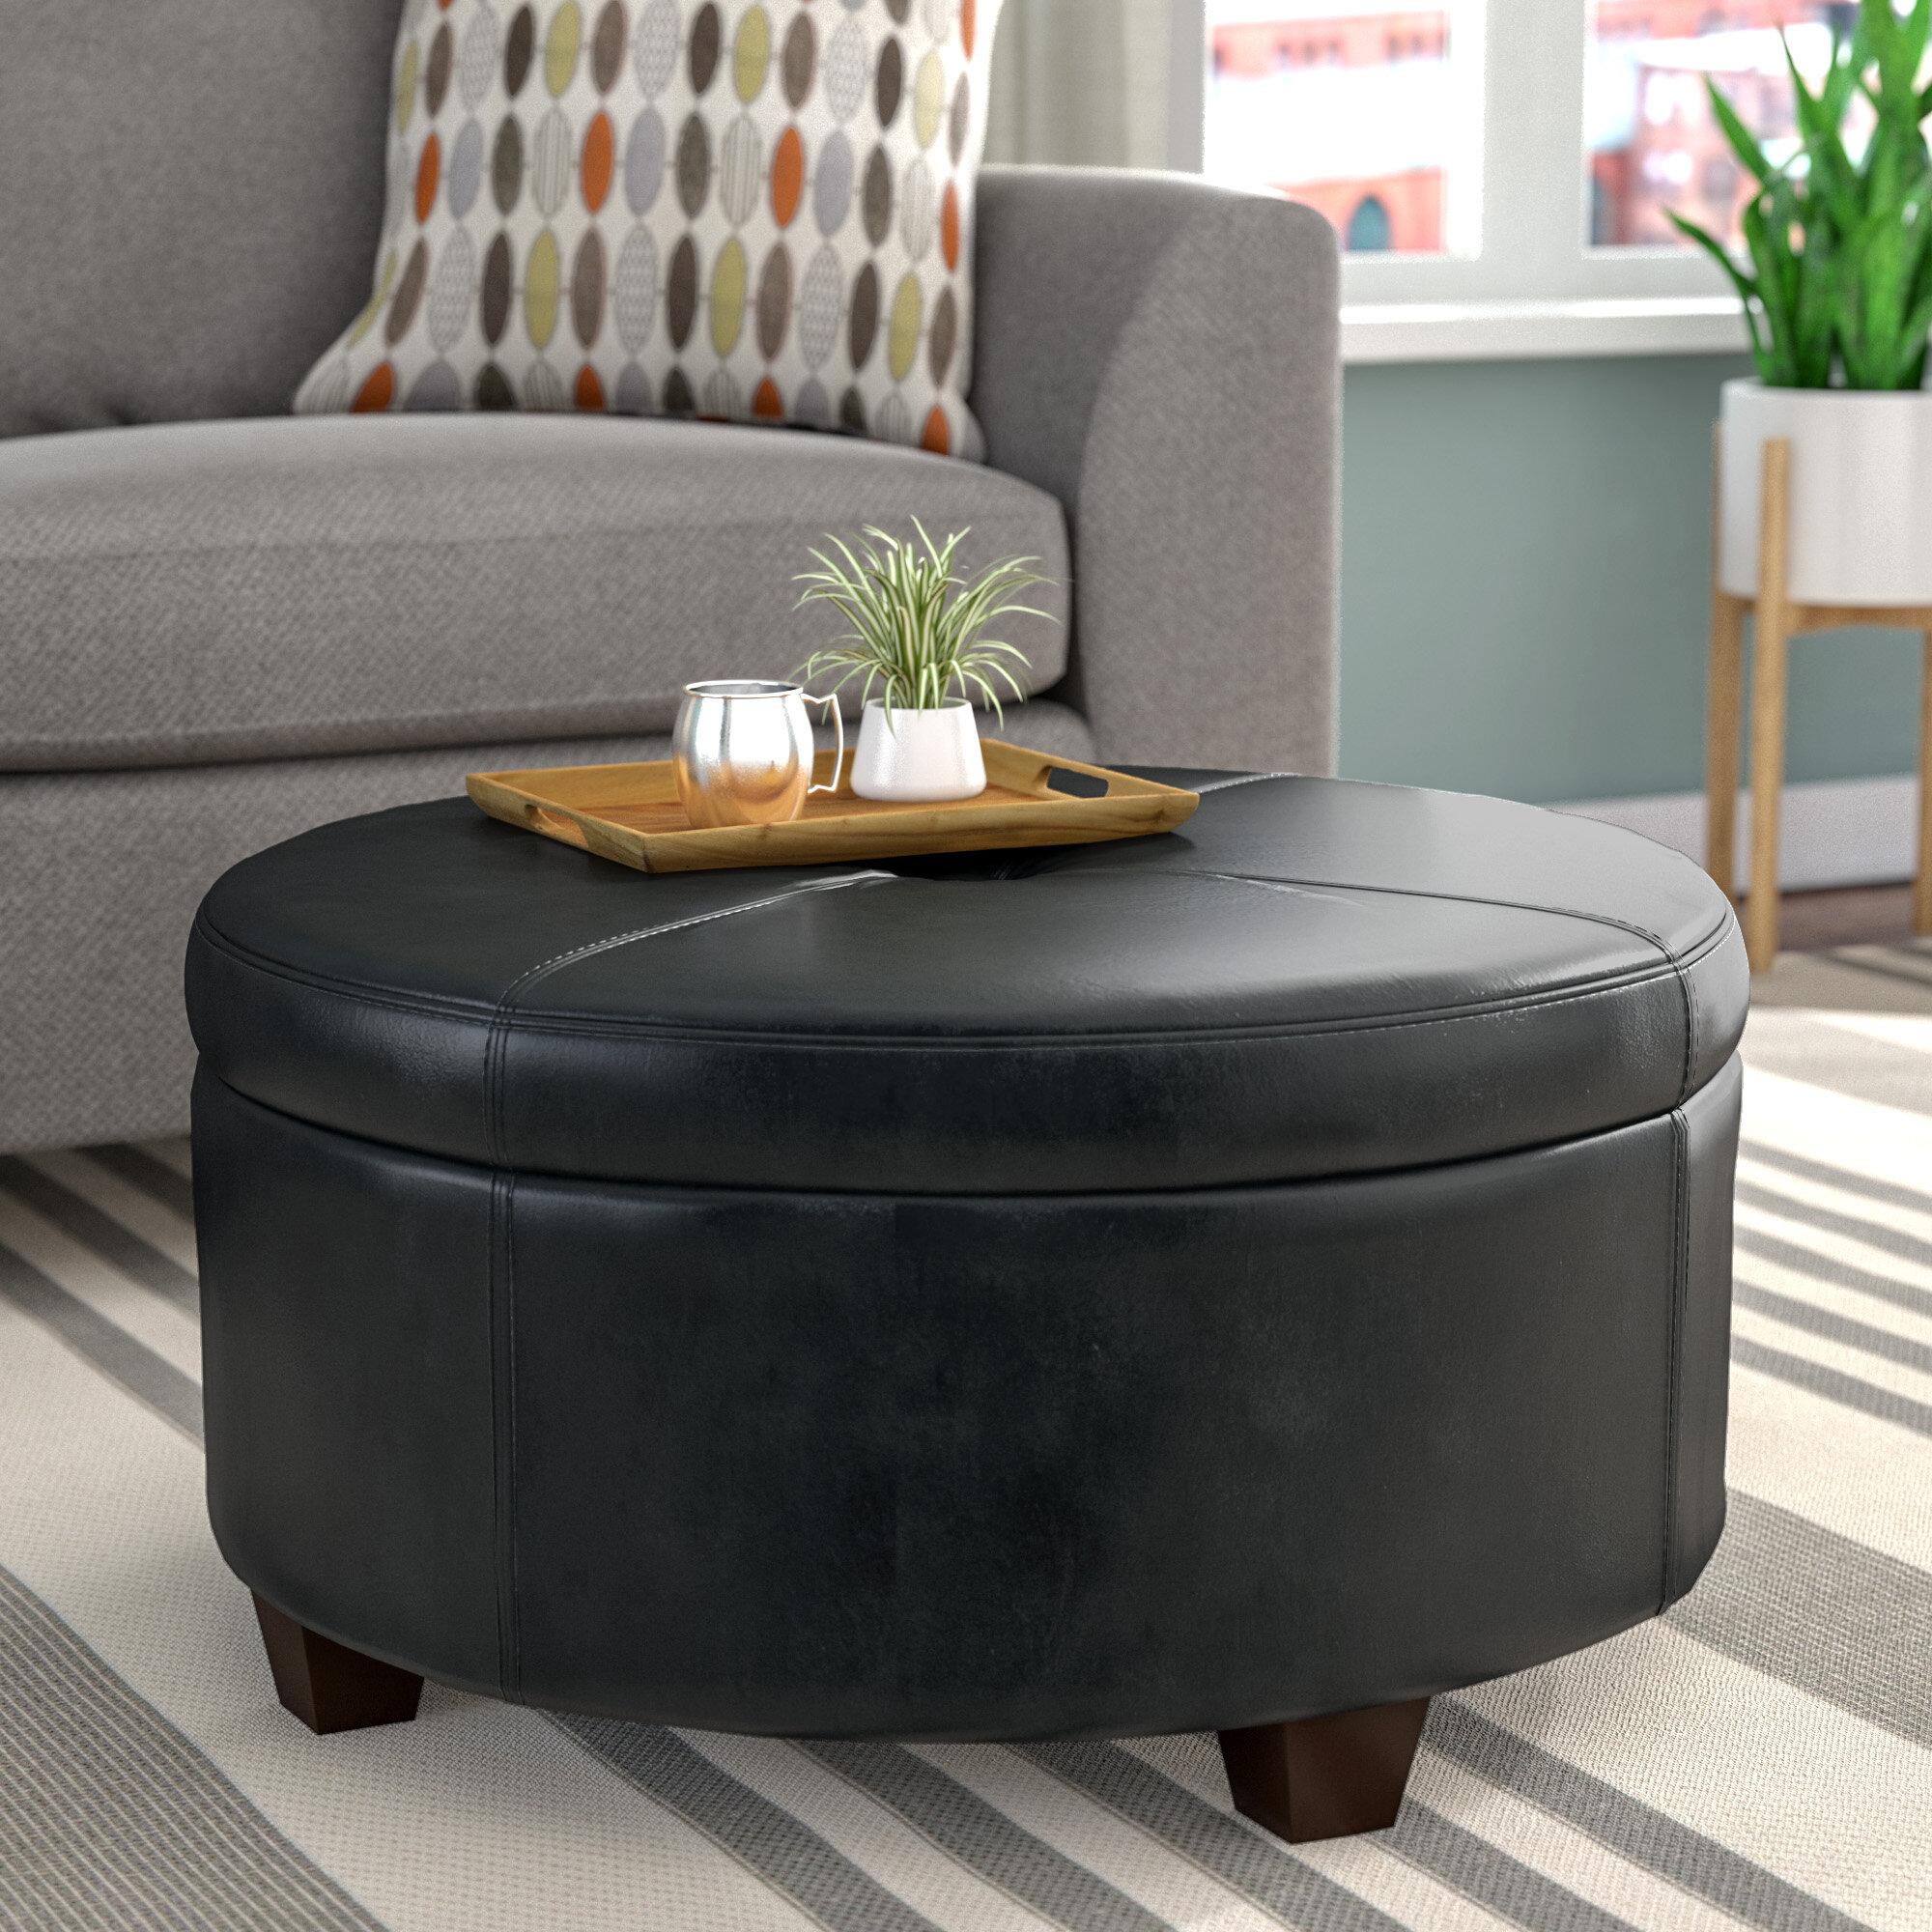 red reviews cocktail ottoman rosiclare pdx wayfair studio barrel furniture